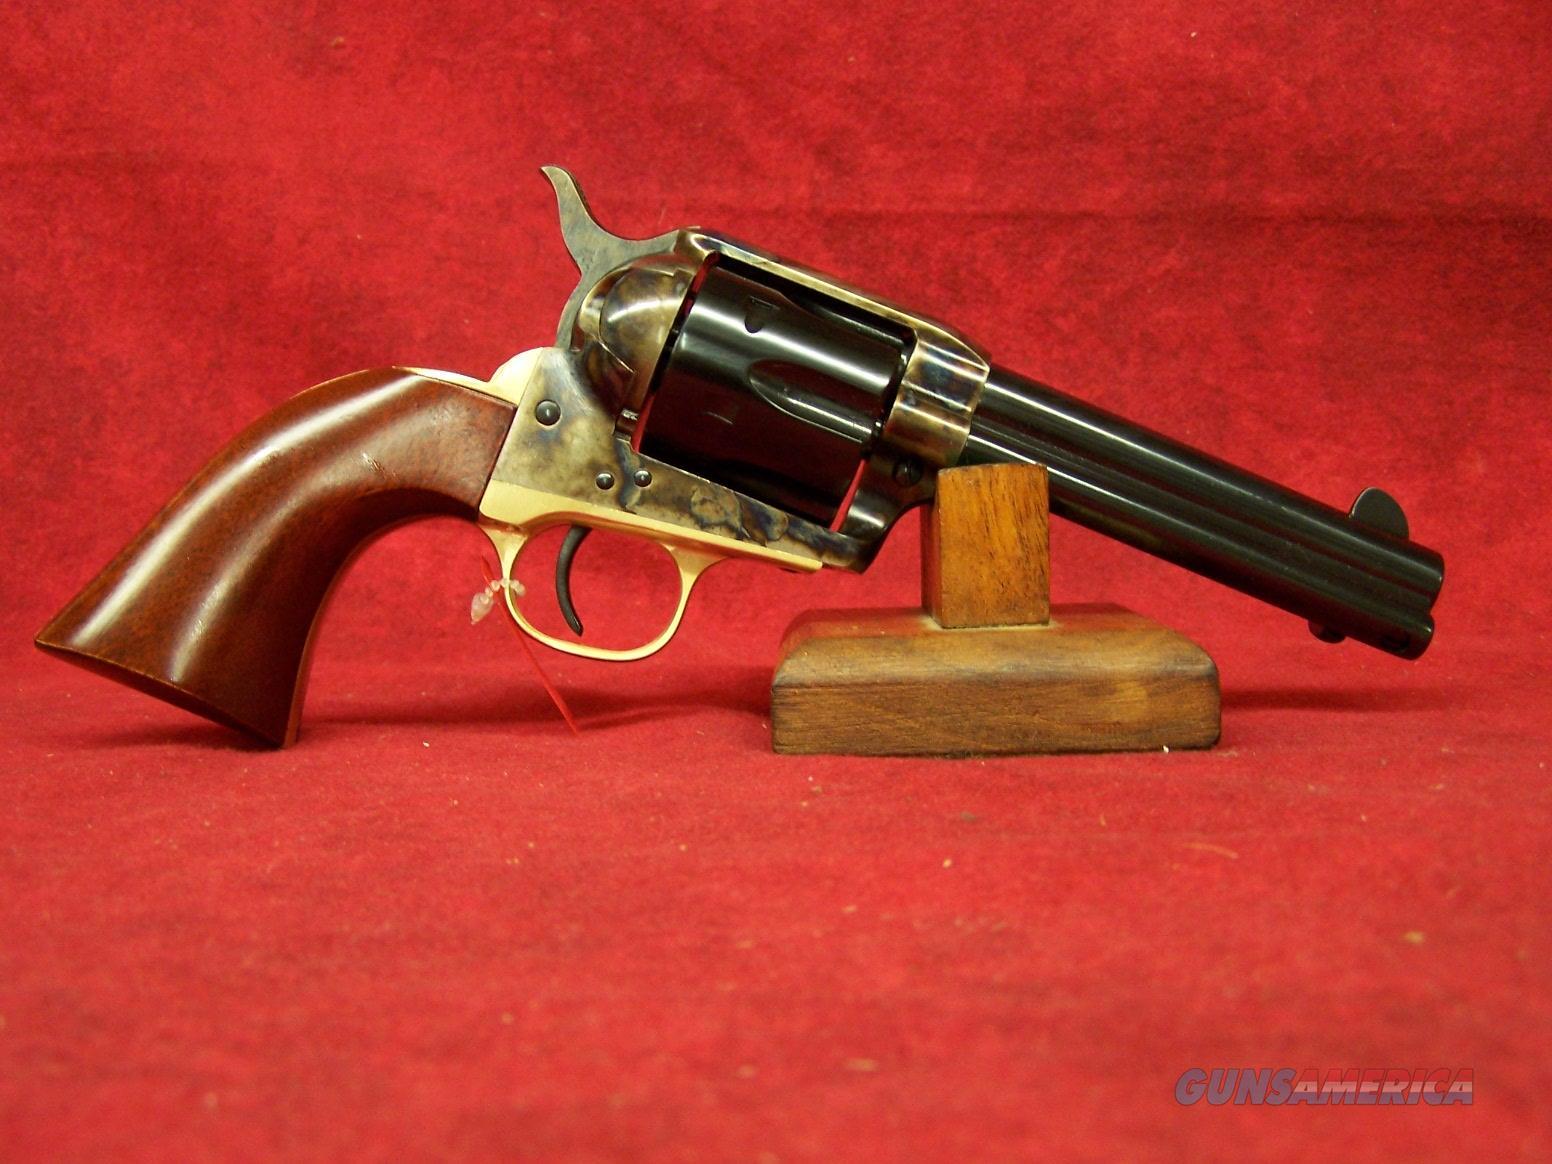 "Uberti Cattleman II NM Brass with Retractable Firing Pin .357 Mag 4.75"" Barrel (356200)  Guns > Pistols > Uberti Pistols > Ctg."